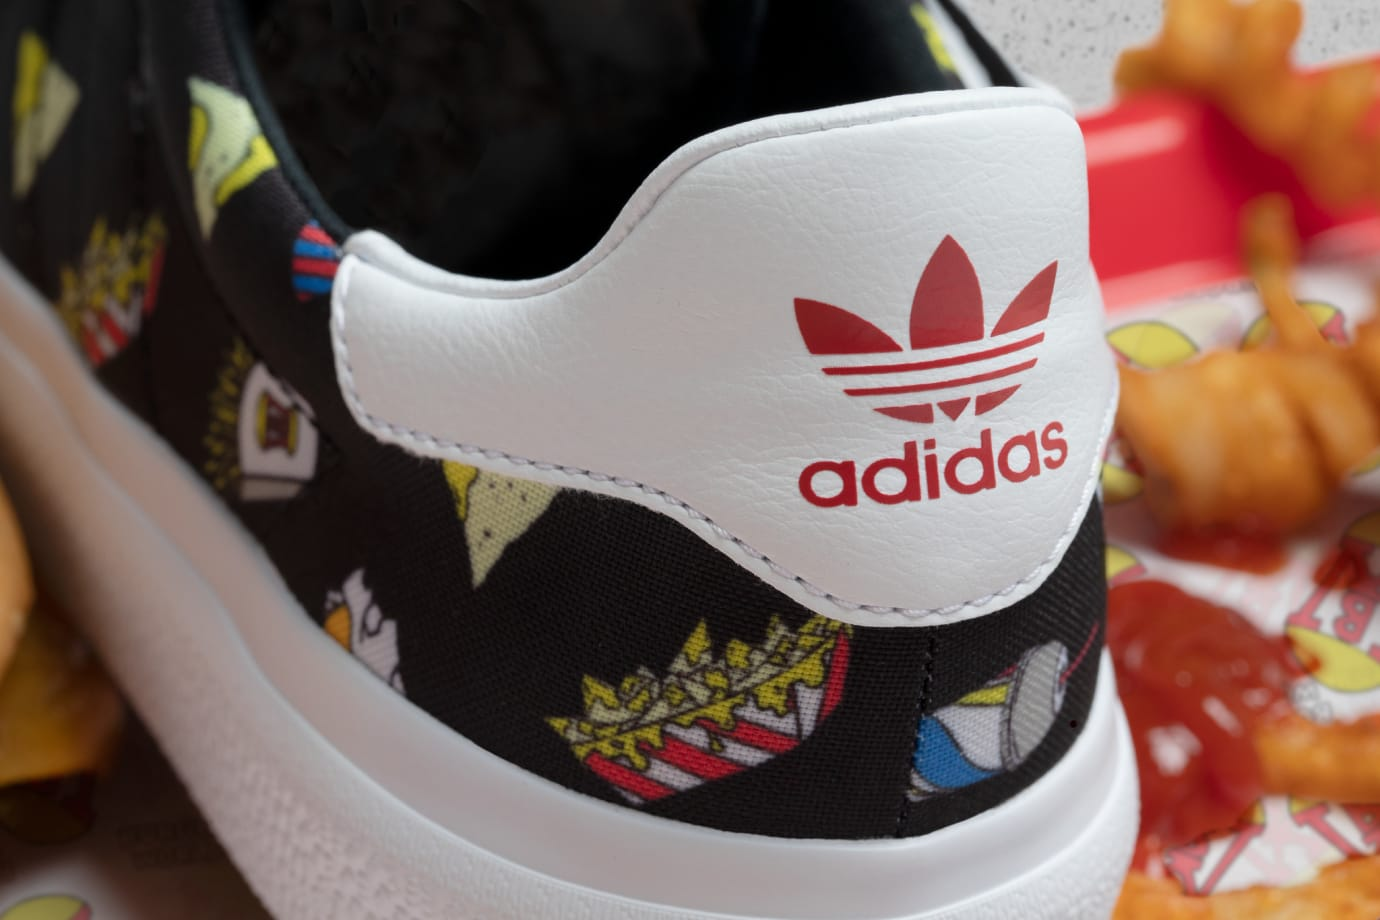 beavis-and-butthead-adidas-3mc-heel